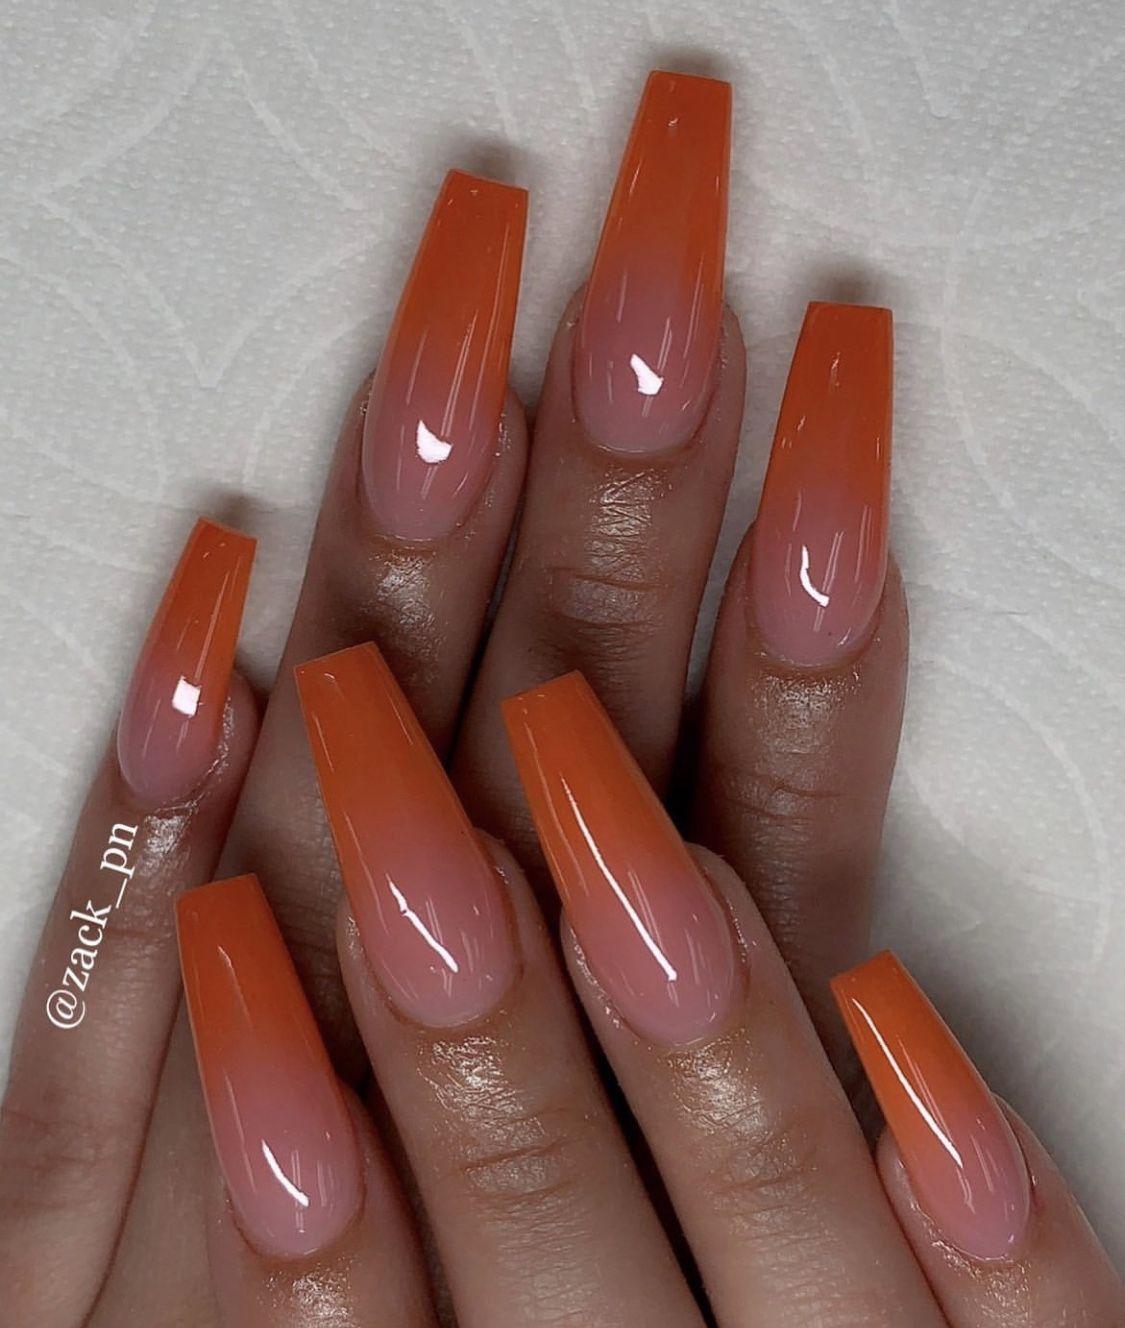 Burnt Orange Ombre Orange Acrylic Nails Fall Acrylic Nails Orange Ombre Nails